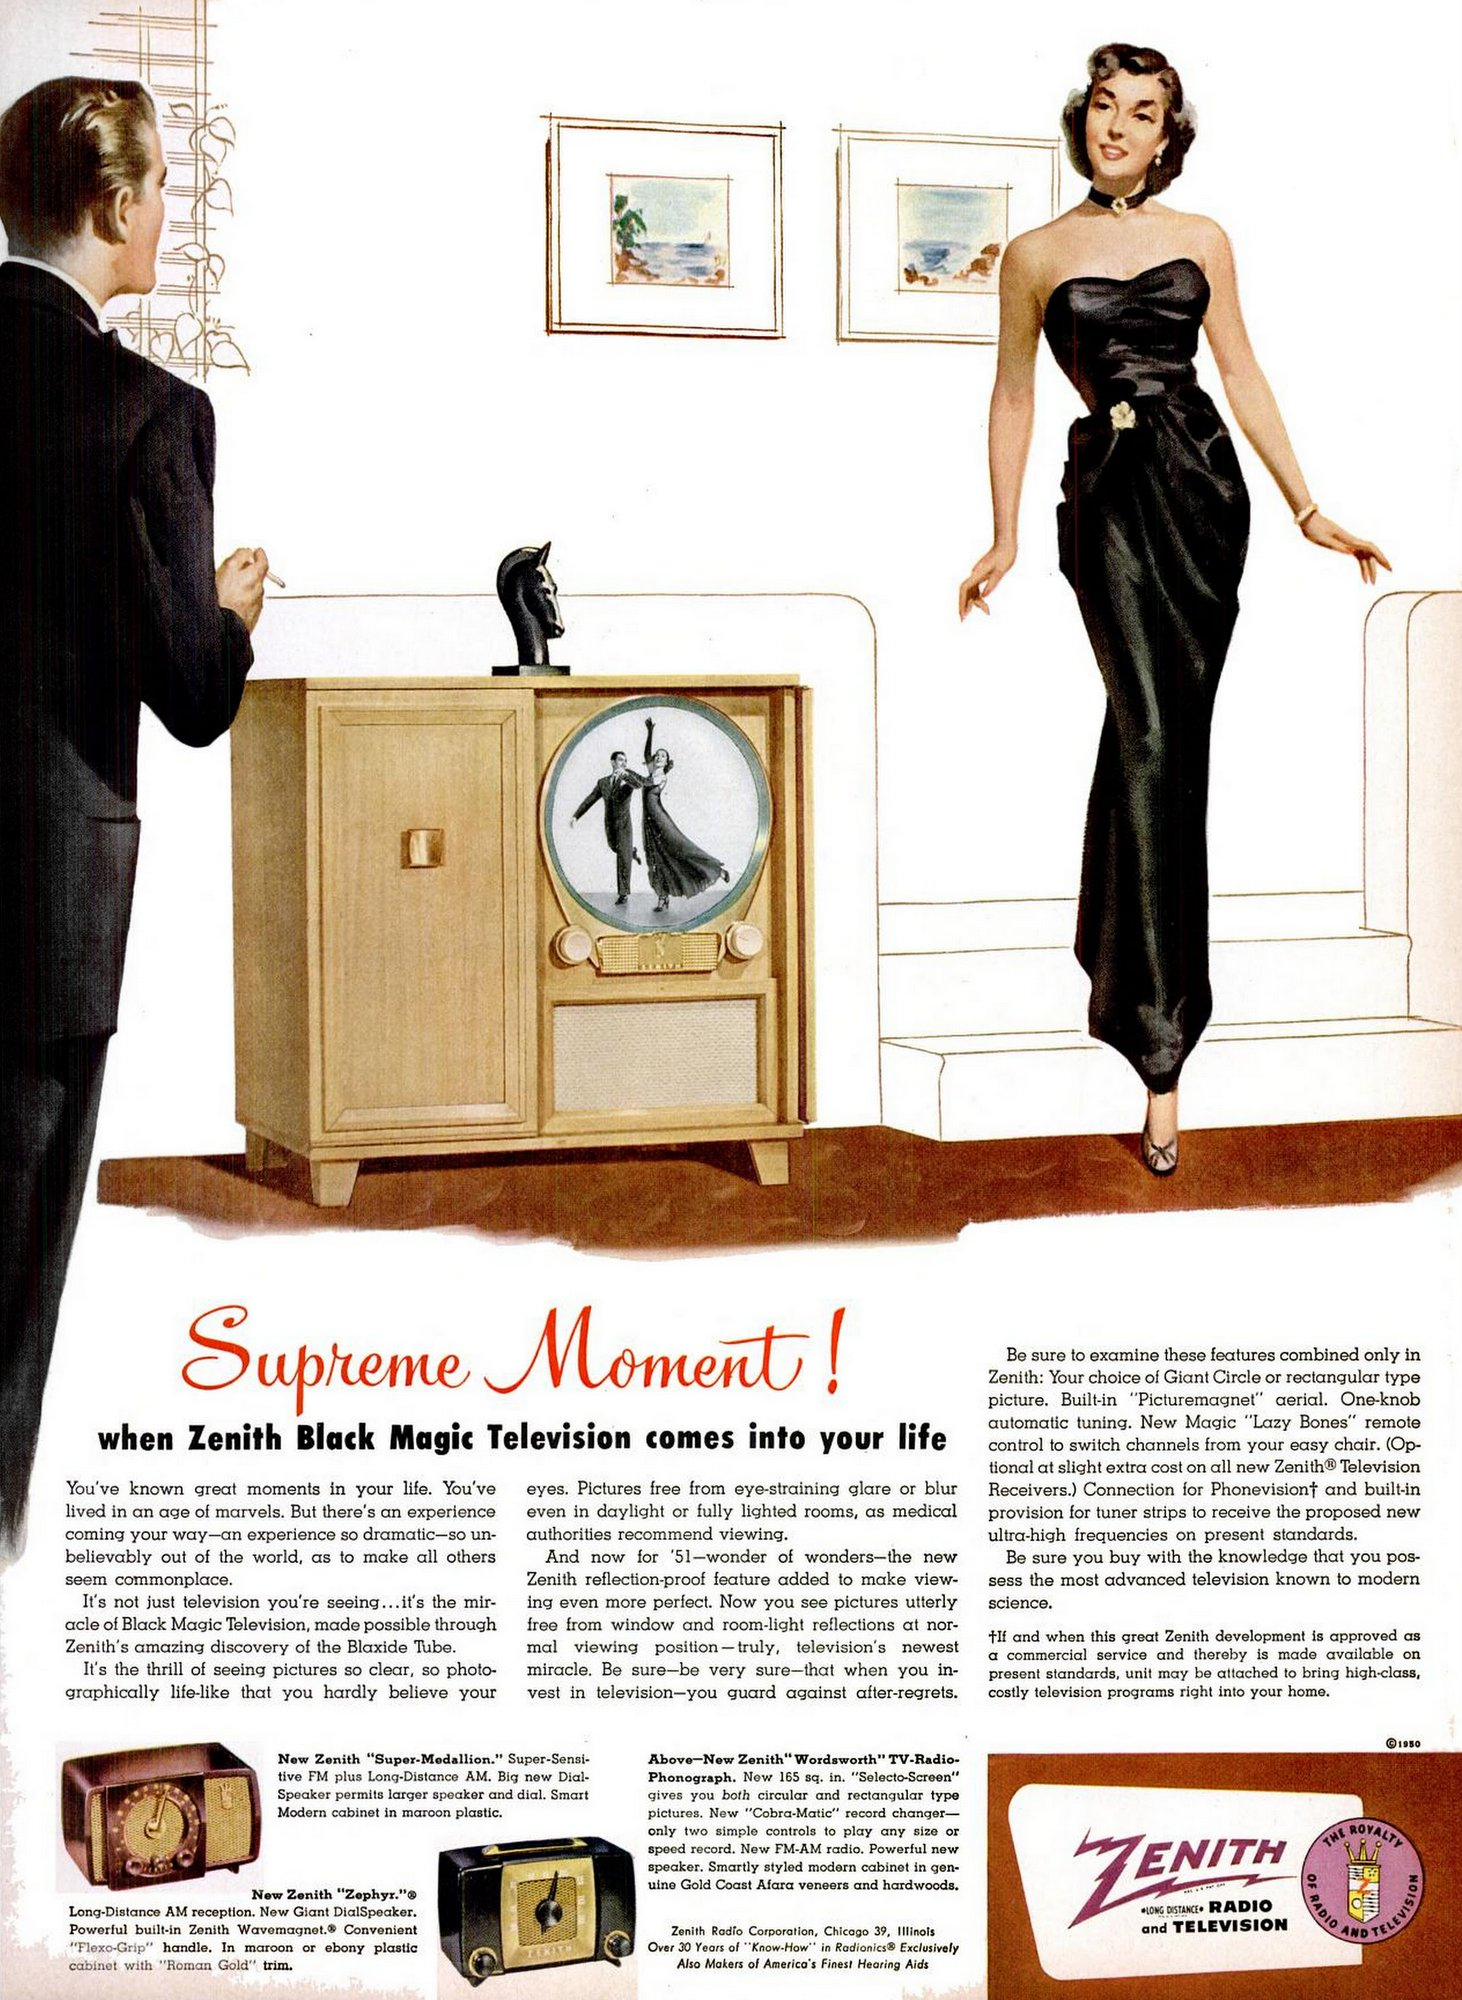 LIFE Nov 27, 1950 Zenith Black Magic TV with round screen